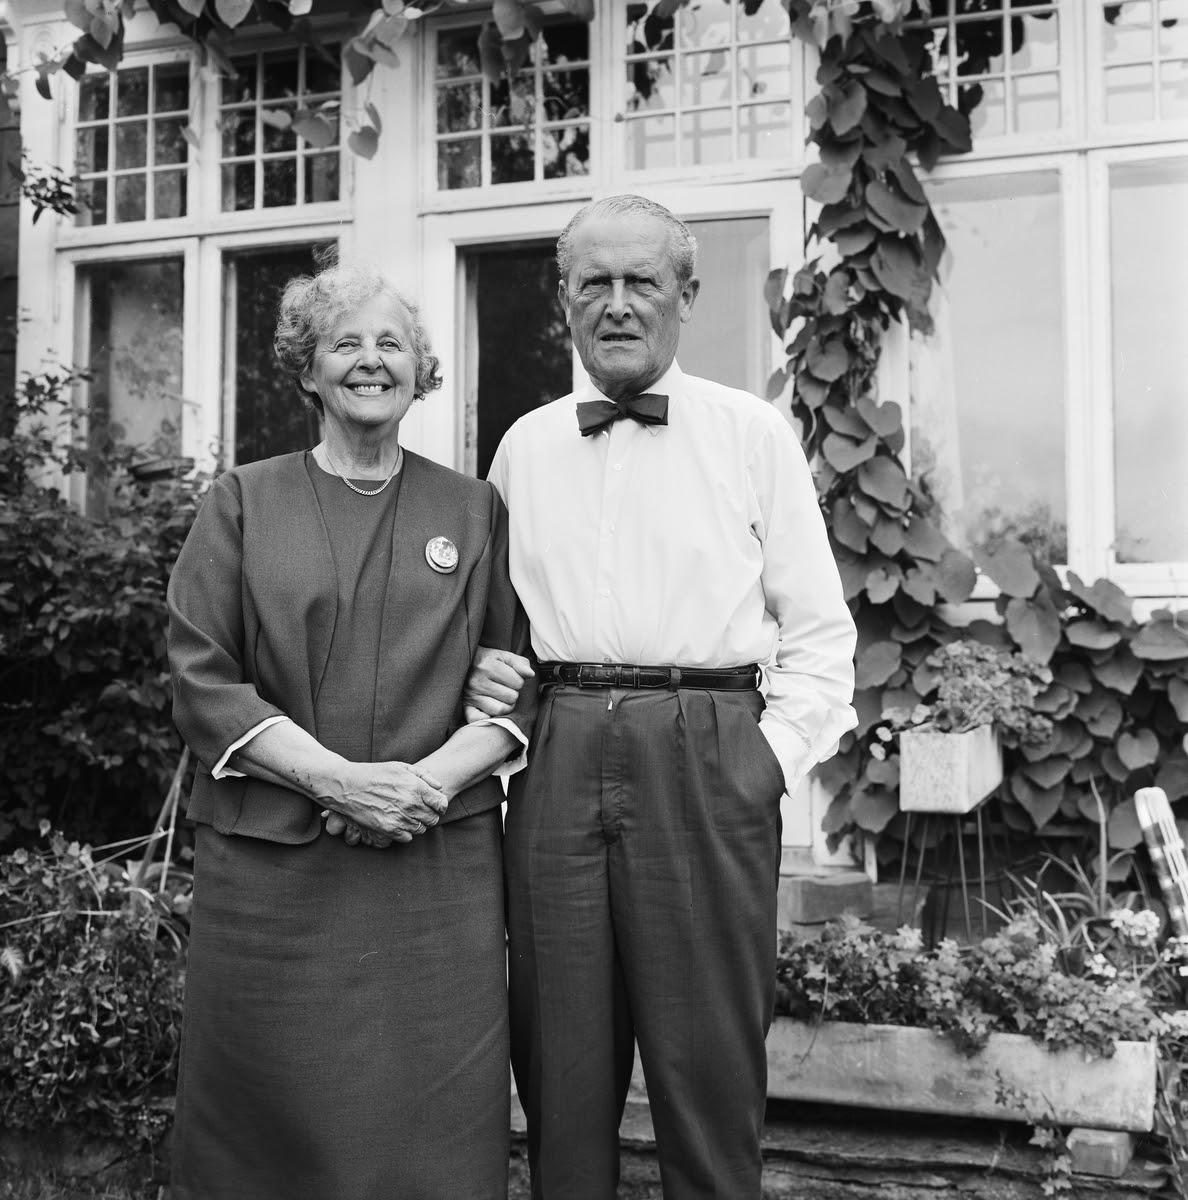 Mr. and Mrs. Hjort